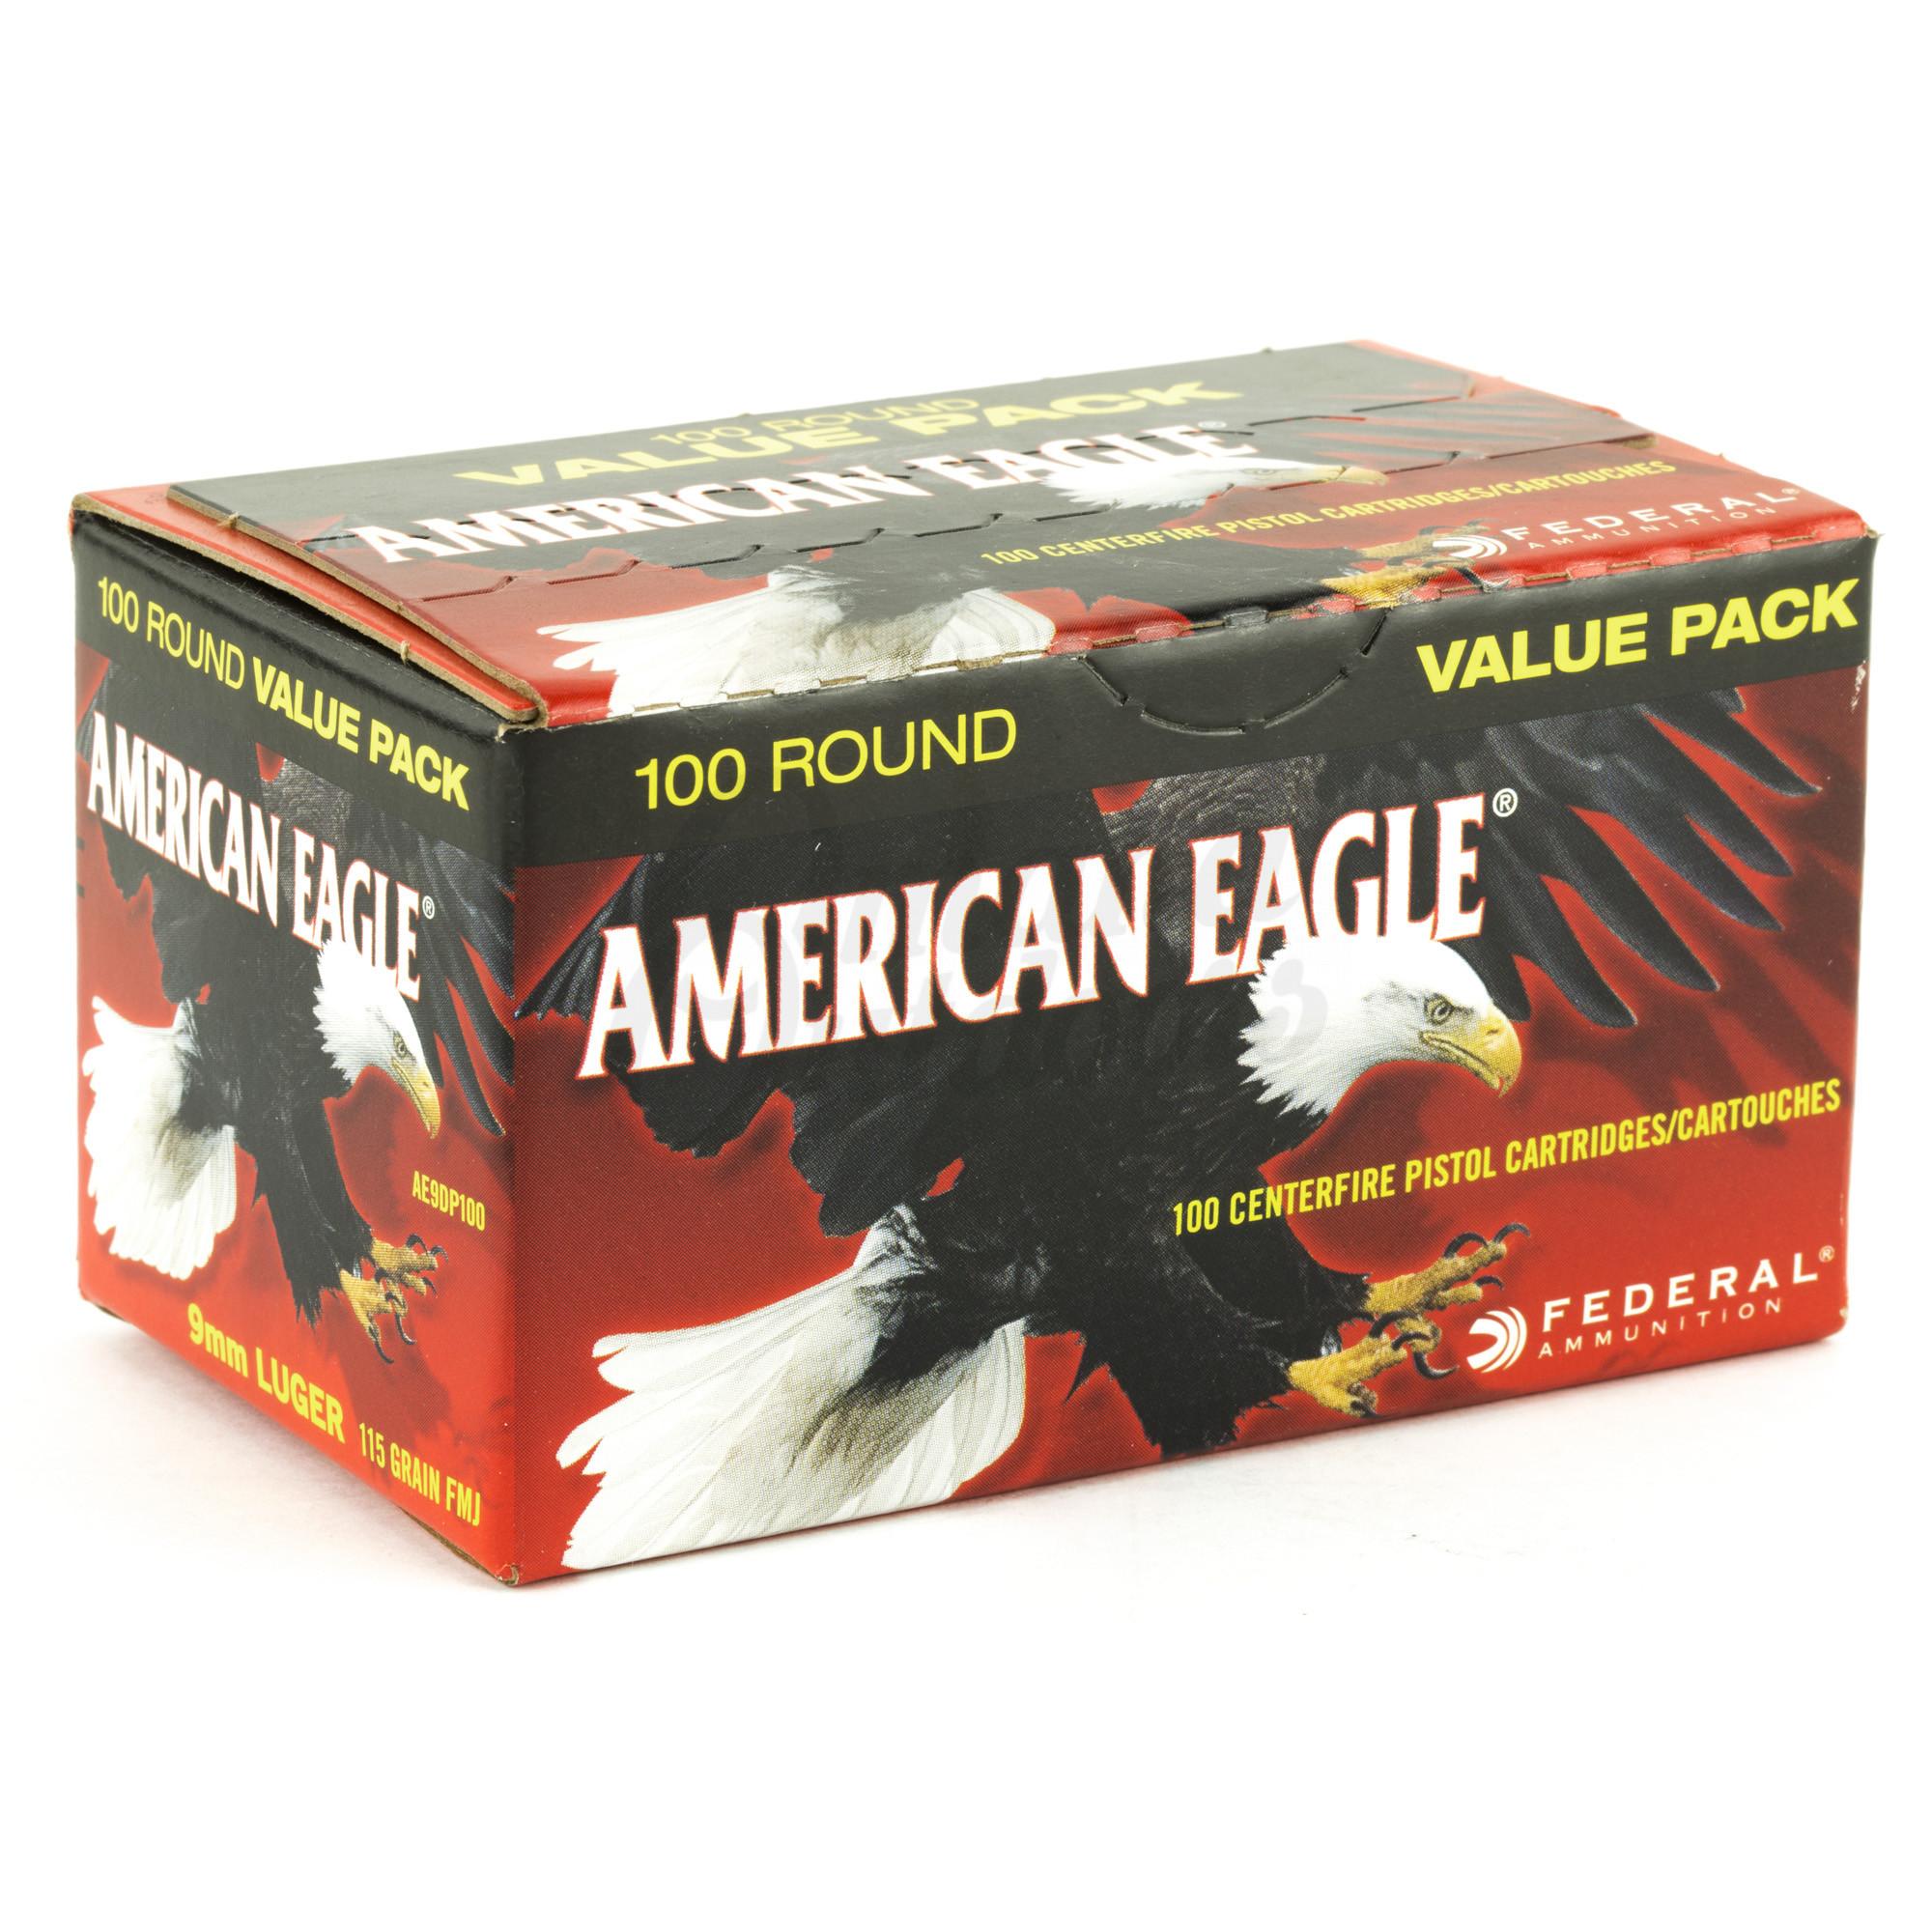 Federal American Eagle 9mm Ammo 115 Grain FMJ 100 Round Box